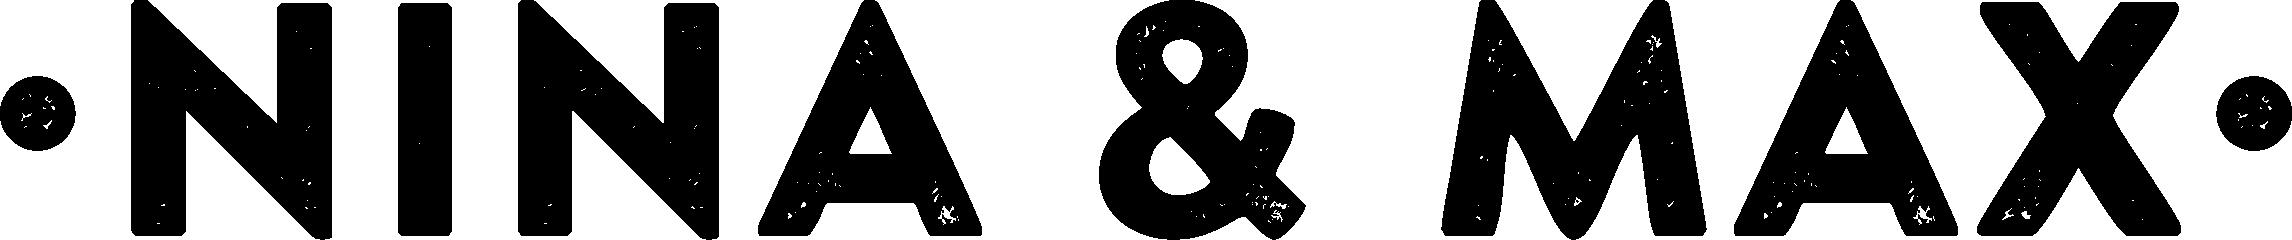 nina max vierkant logo